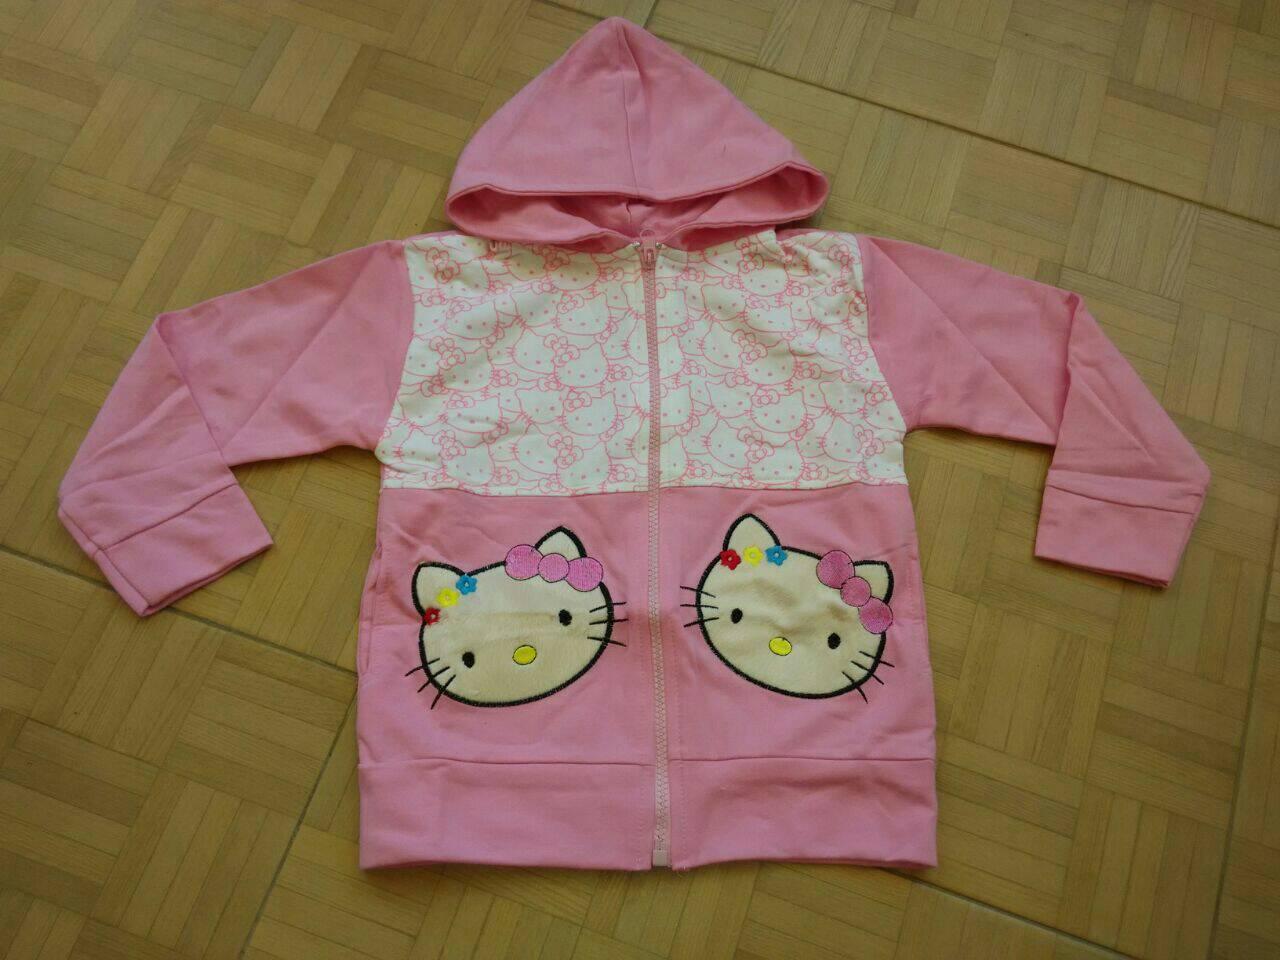 Jual Jaket Anak Twins Hello Kitty Size 6Thn - Cherie Blossom ... ccd14f19d7